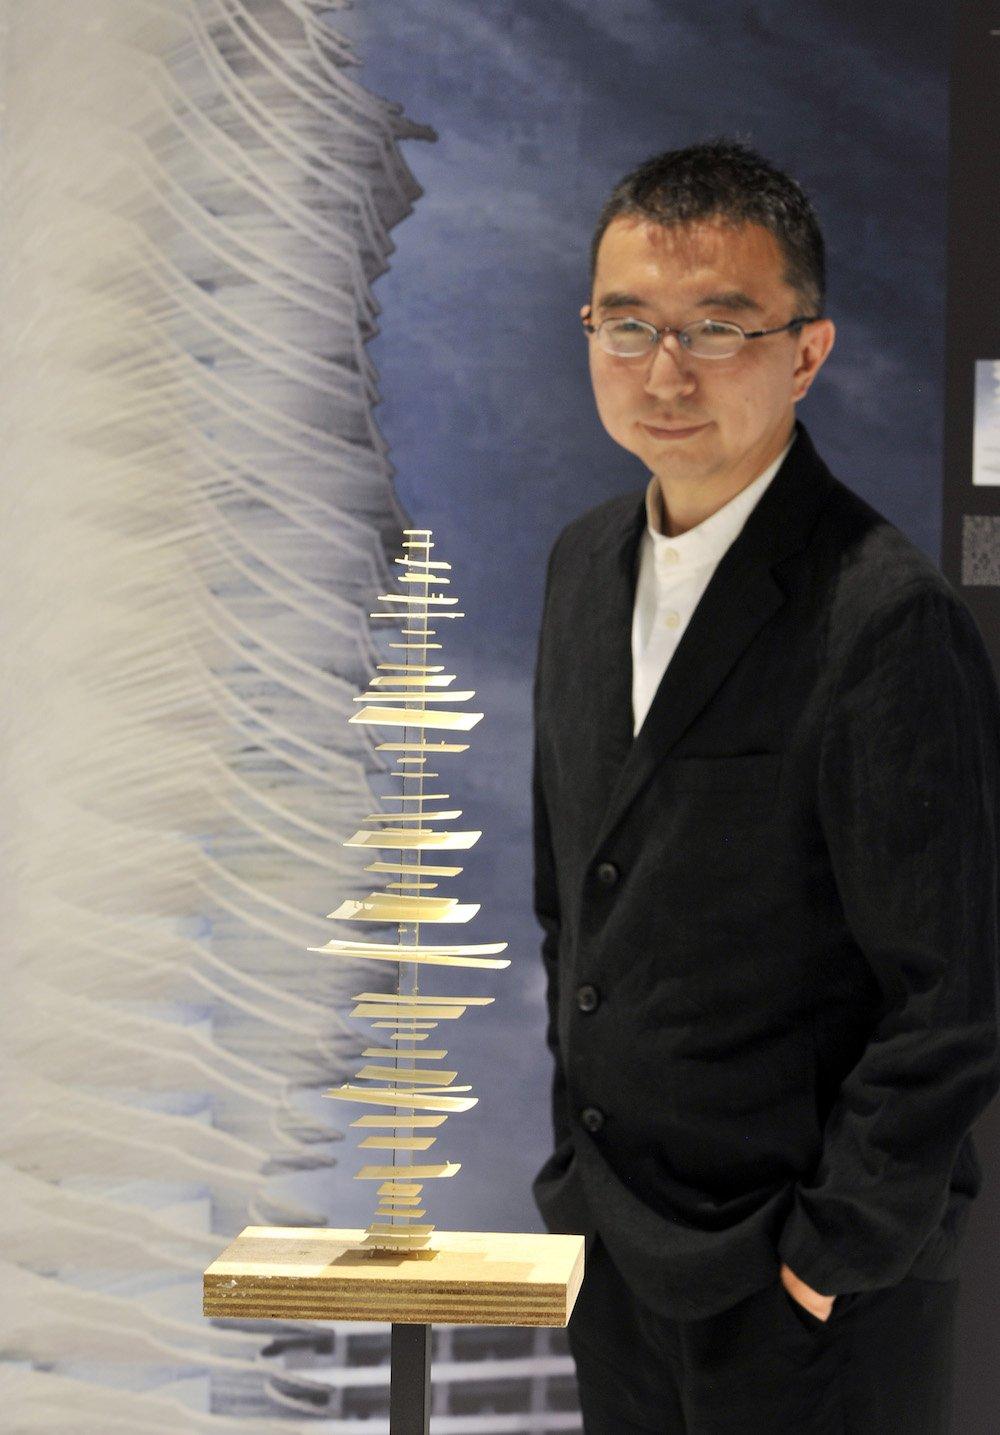 Sou Fujimoto at Japan House London. Photo credit Adrian Brooks/Imagewise